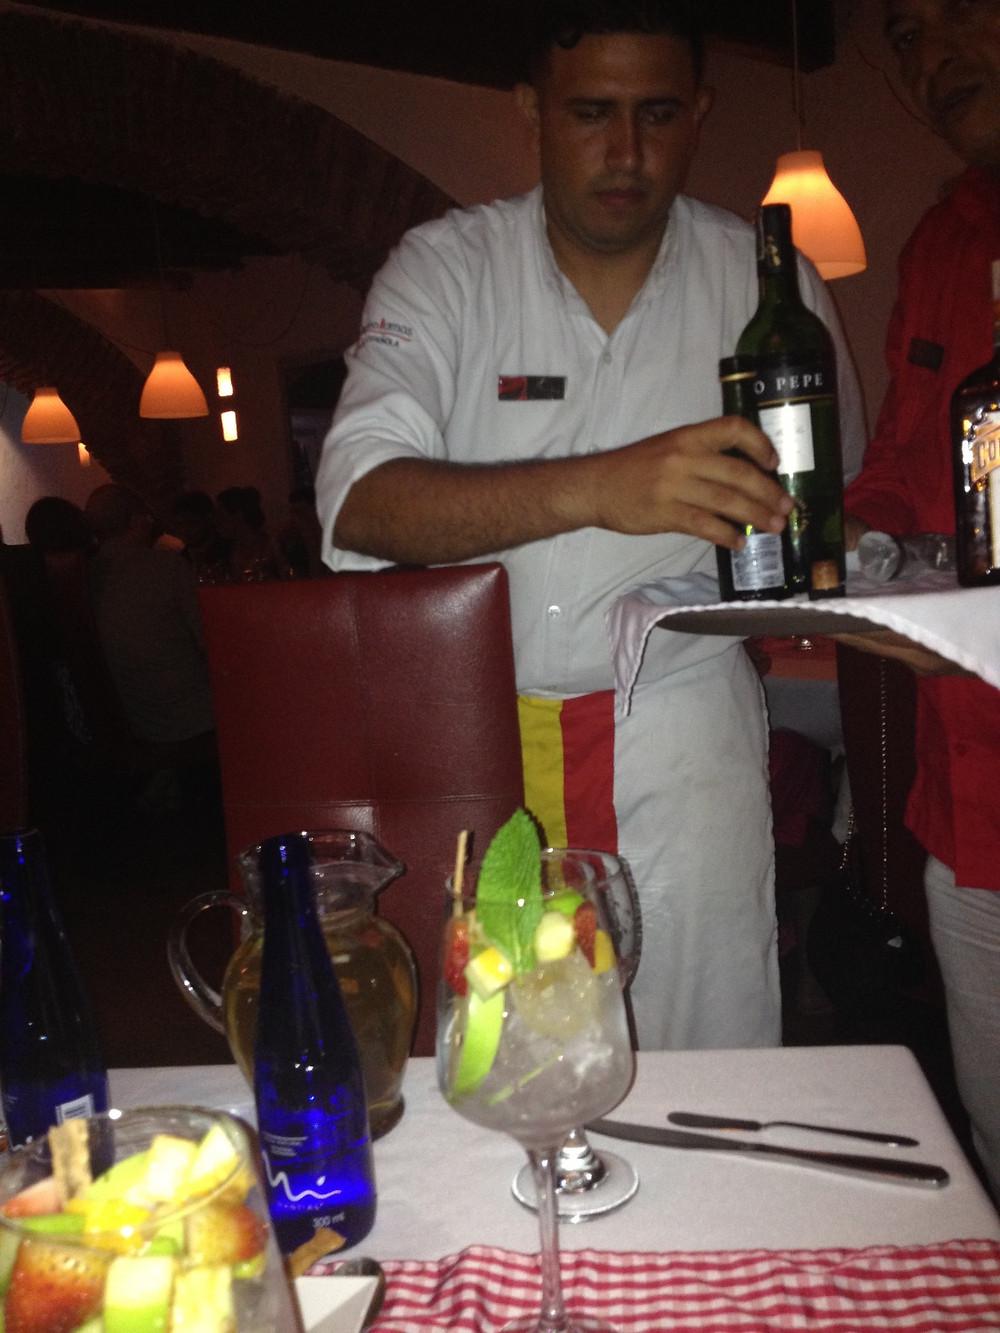 Our server at El Burlador de Sevilla is preparing to make a refreshing white Sangria